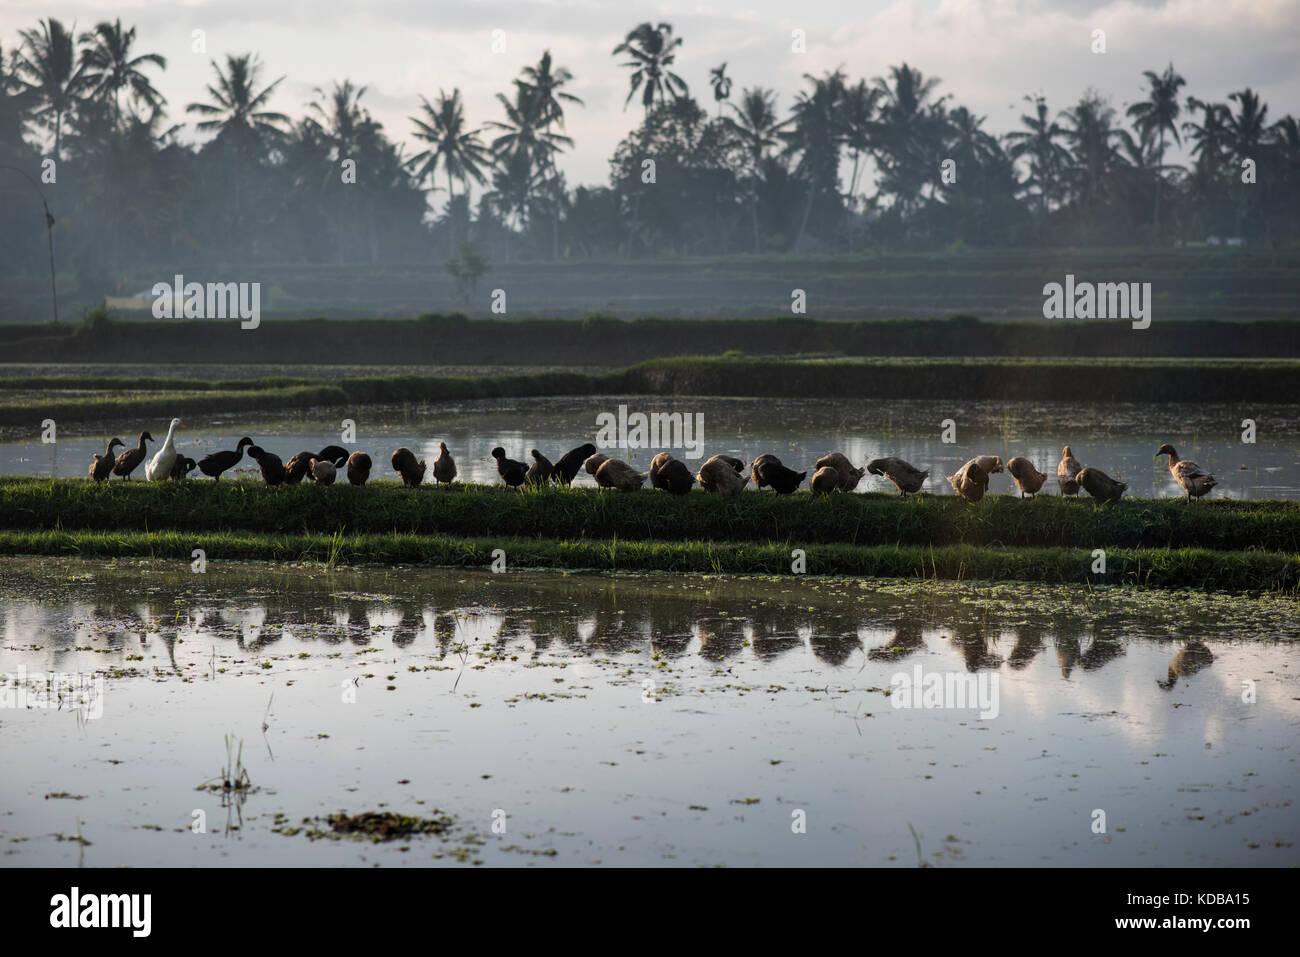 Row of ducks in a rice field of Ubud, Bali, Indonesia. - Stock Image